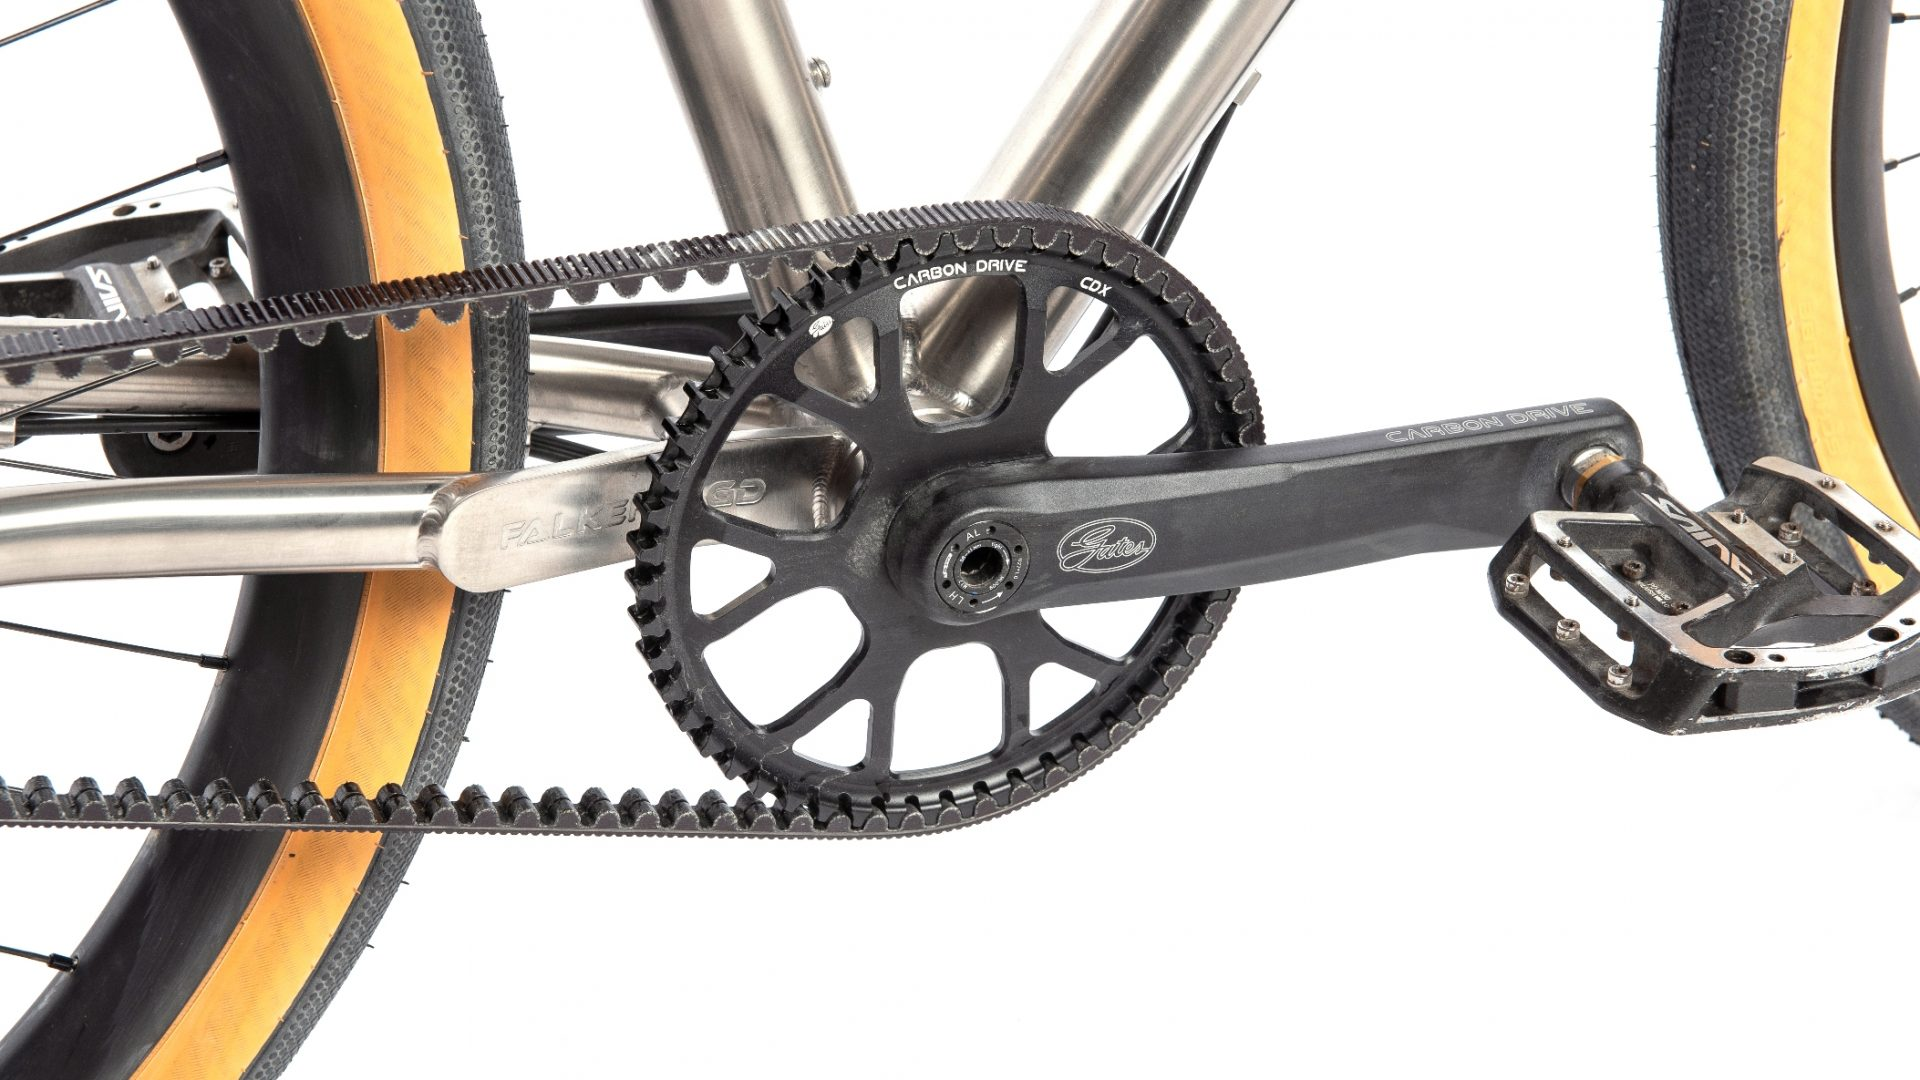 One Bike for Life in Vollendung aus Titan